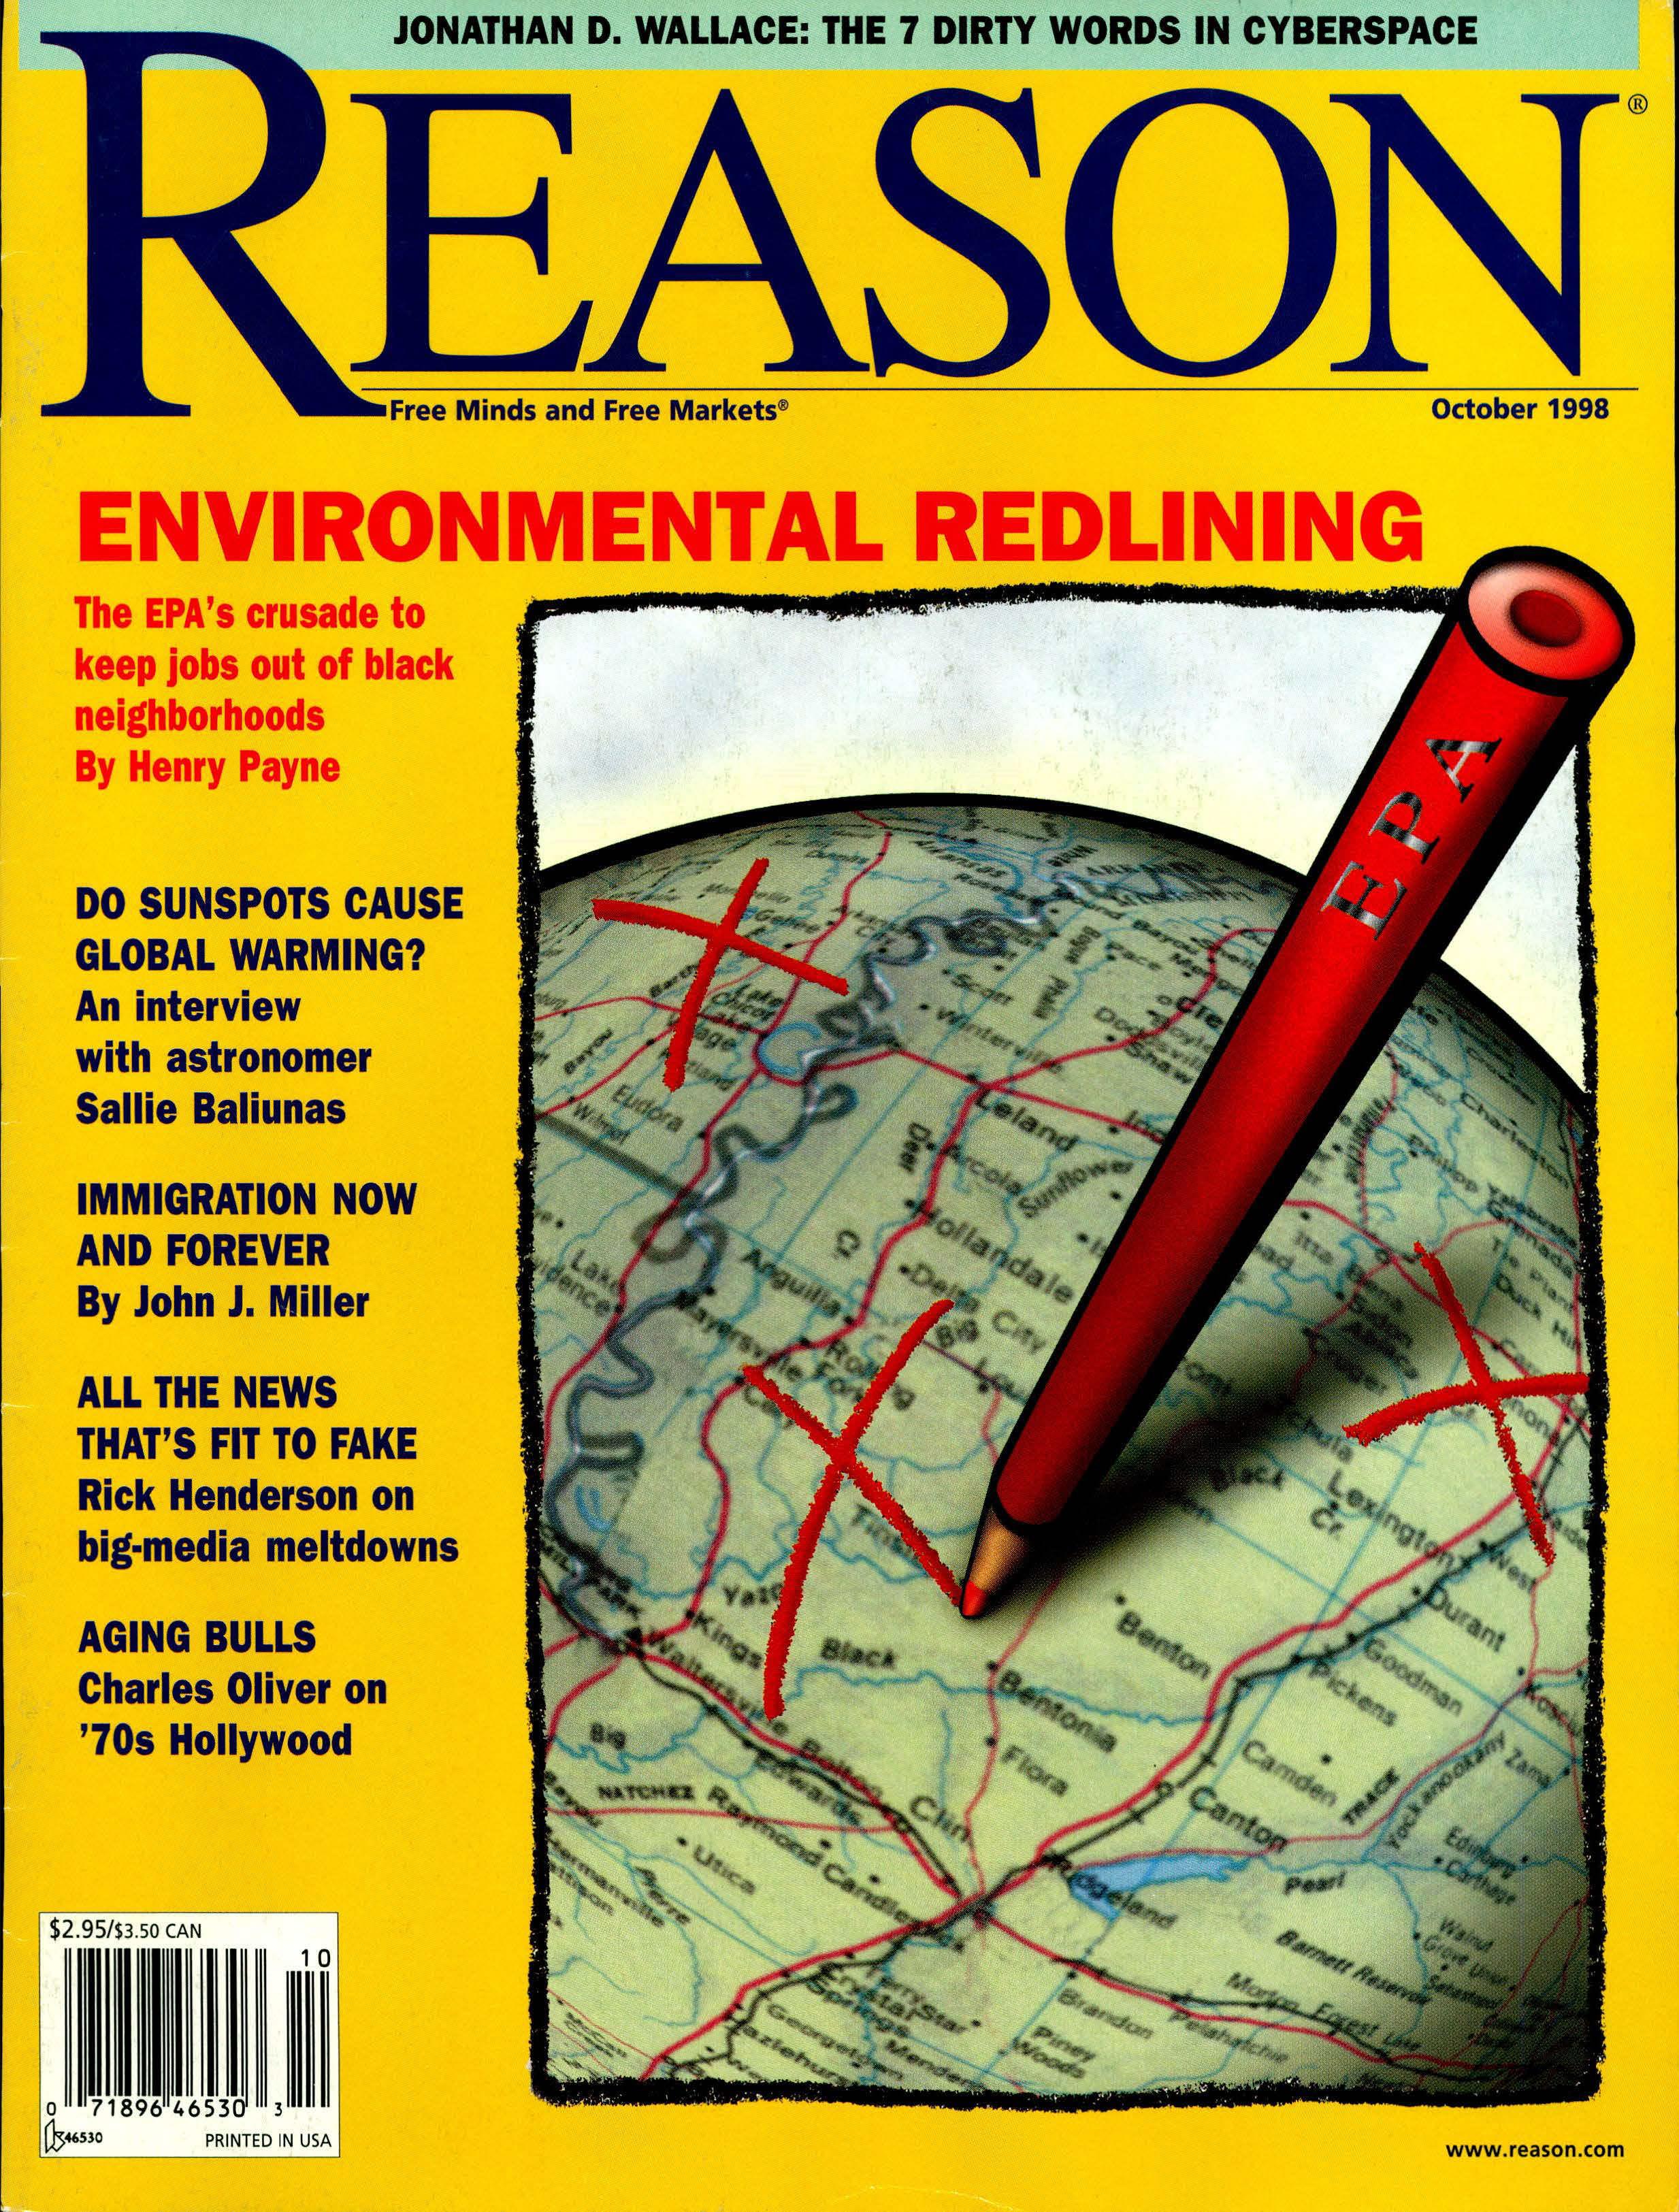 Reason Magazine, October 1998 cover image